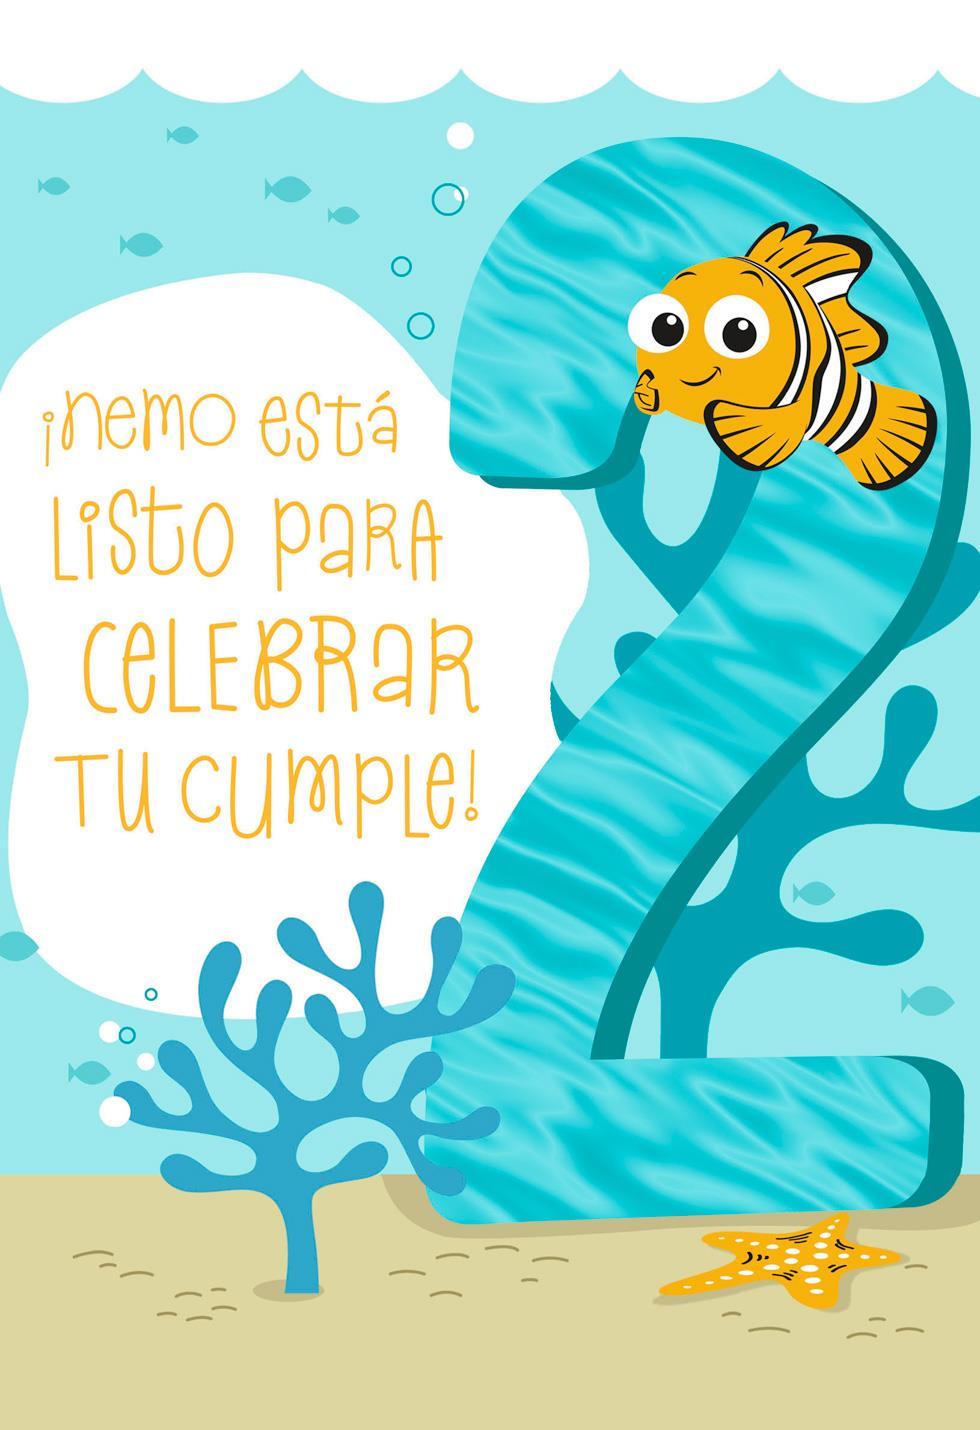 Disney Pixar Finding Nemo Spanish Language 2nd Birthday Card